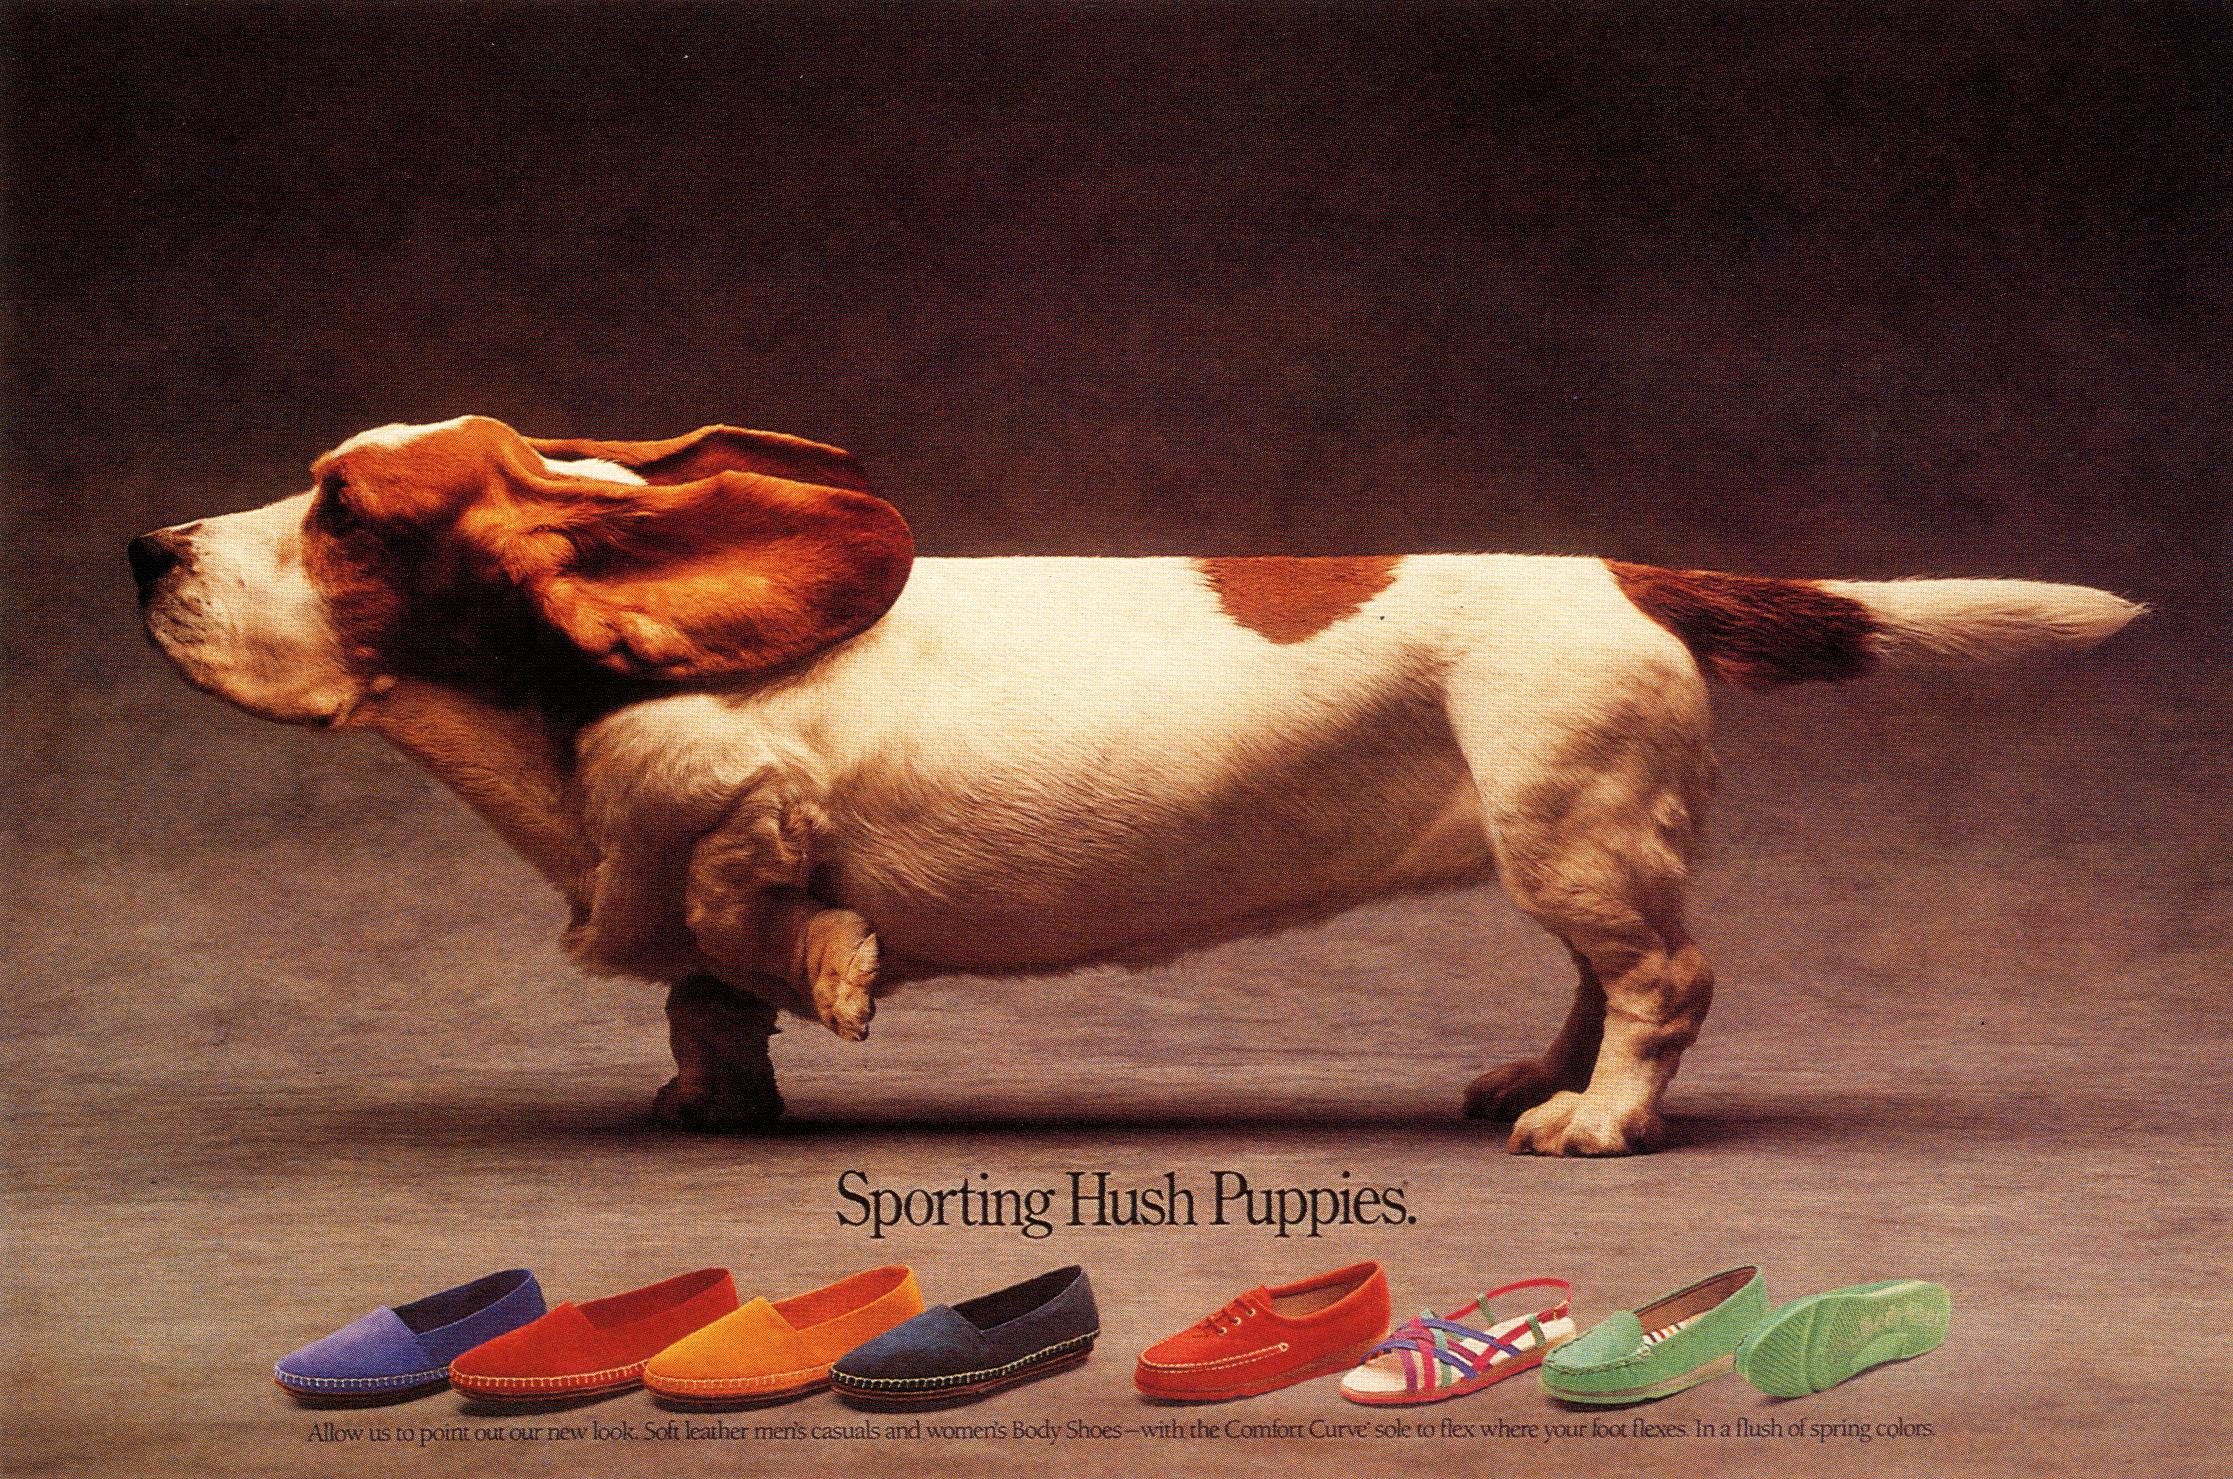 Fallon McElligott, Hush Puppies 'Sporting'-01